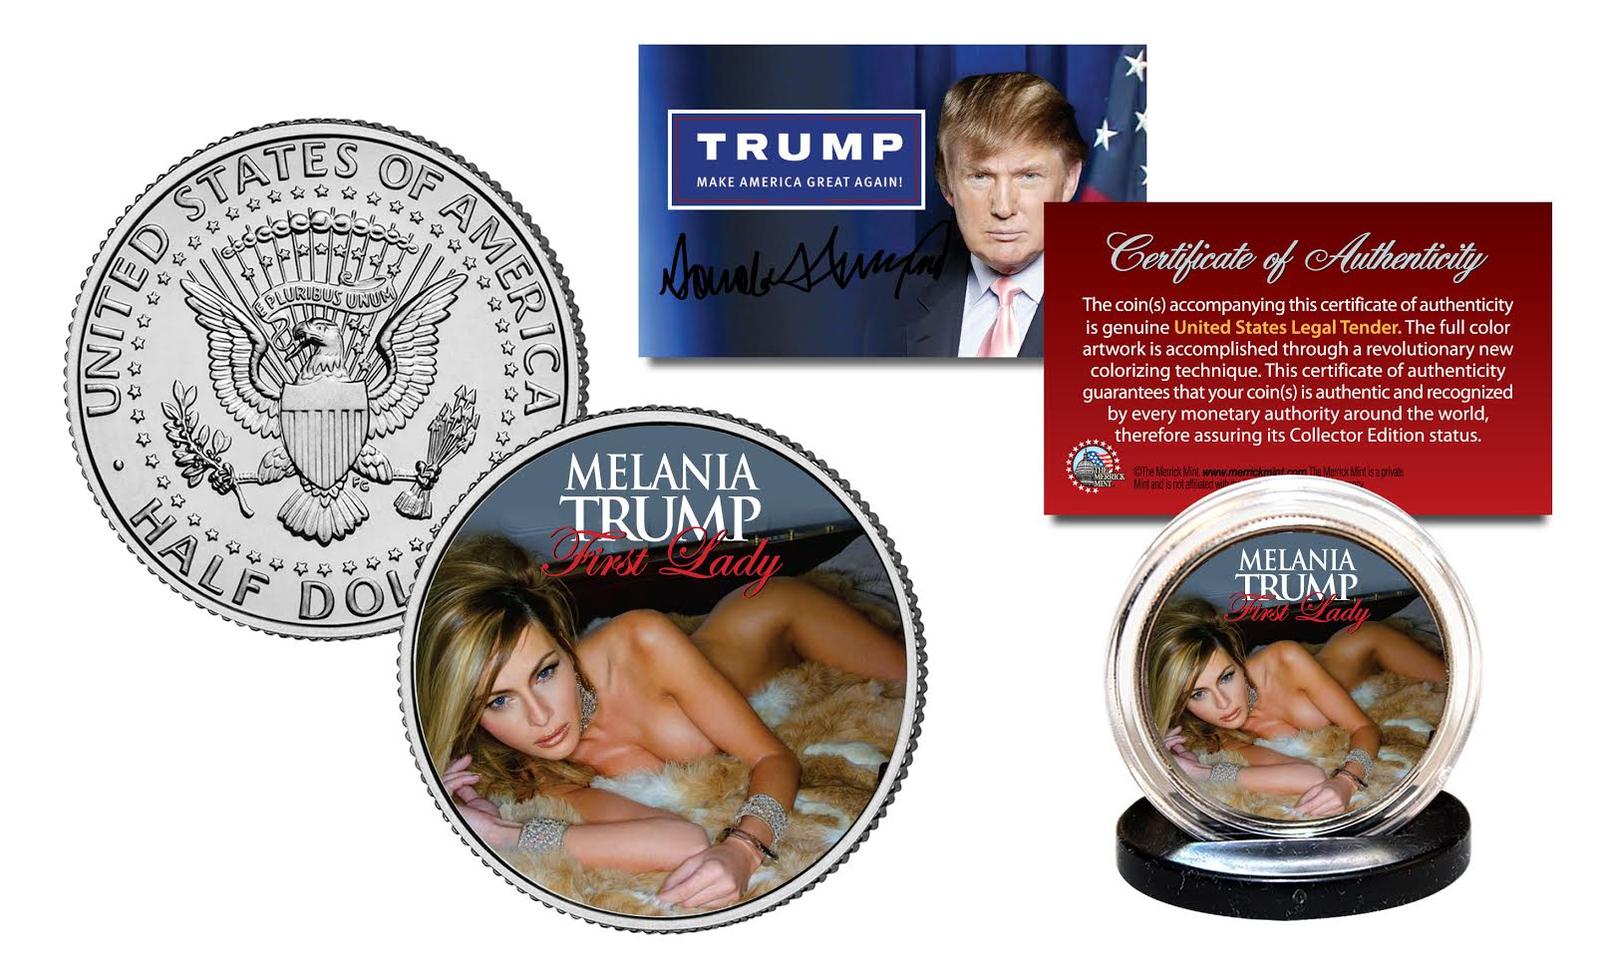 MELANIA TRUMP First Lady President Election OFFICIAL 2016 JFK Half Dollar Coin